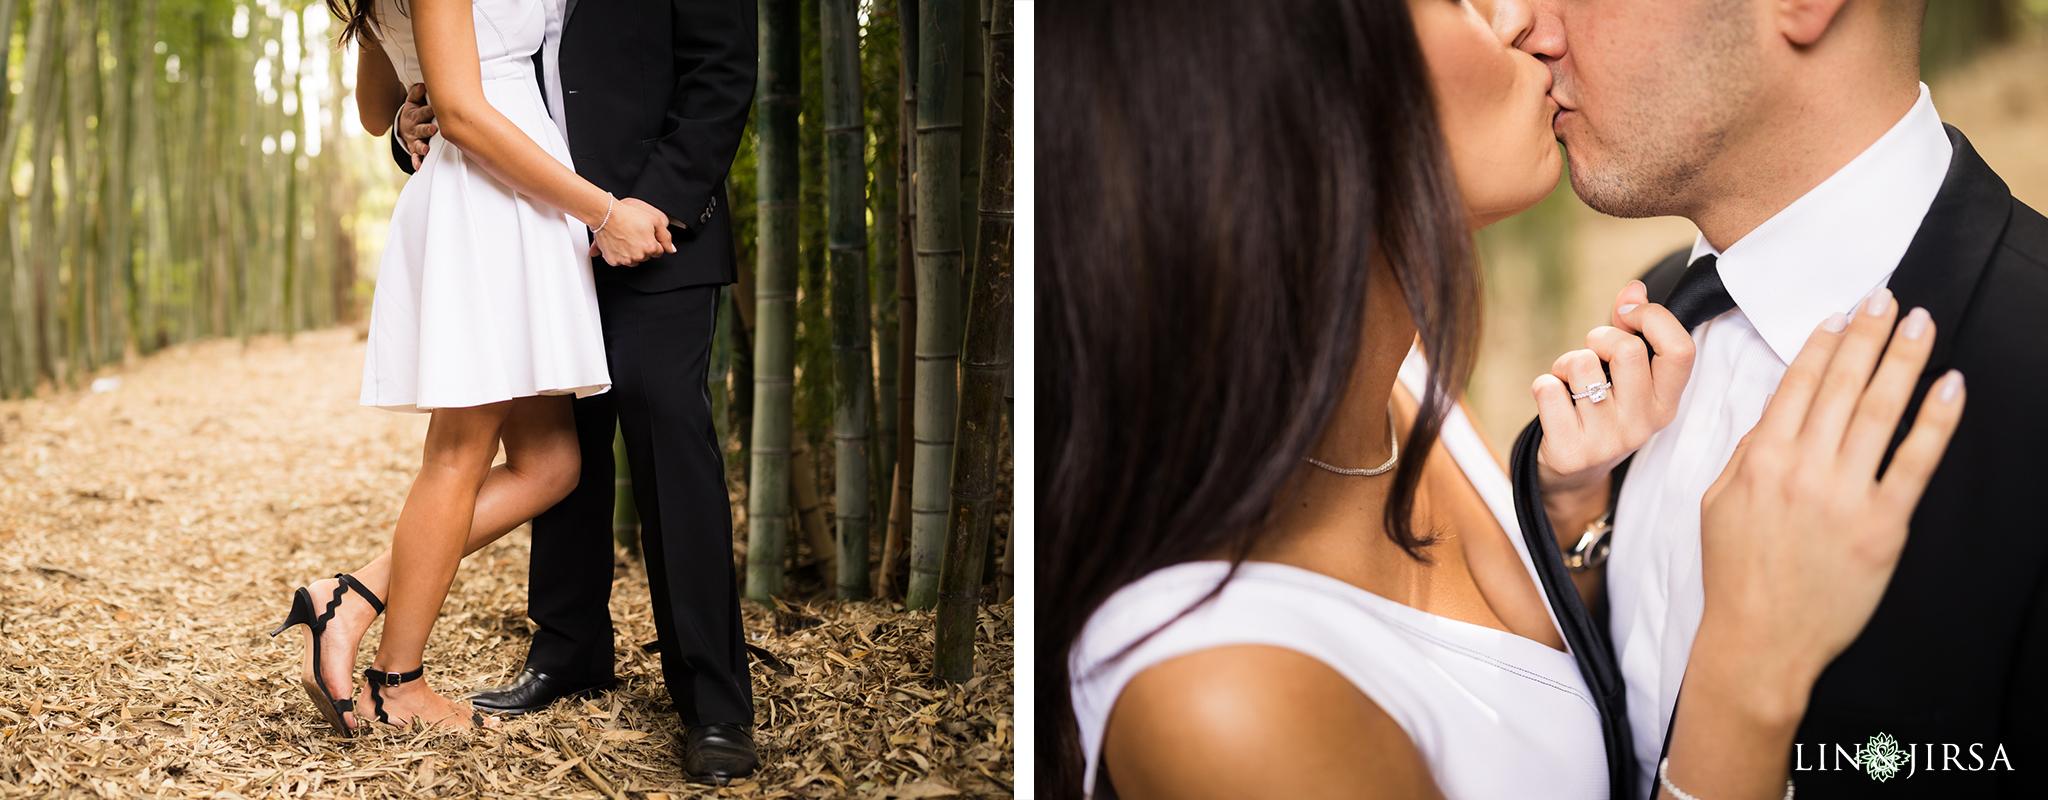 03-Los-angeles-arboretum-engagement-photography